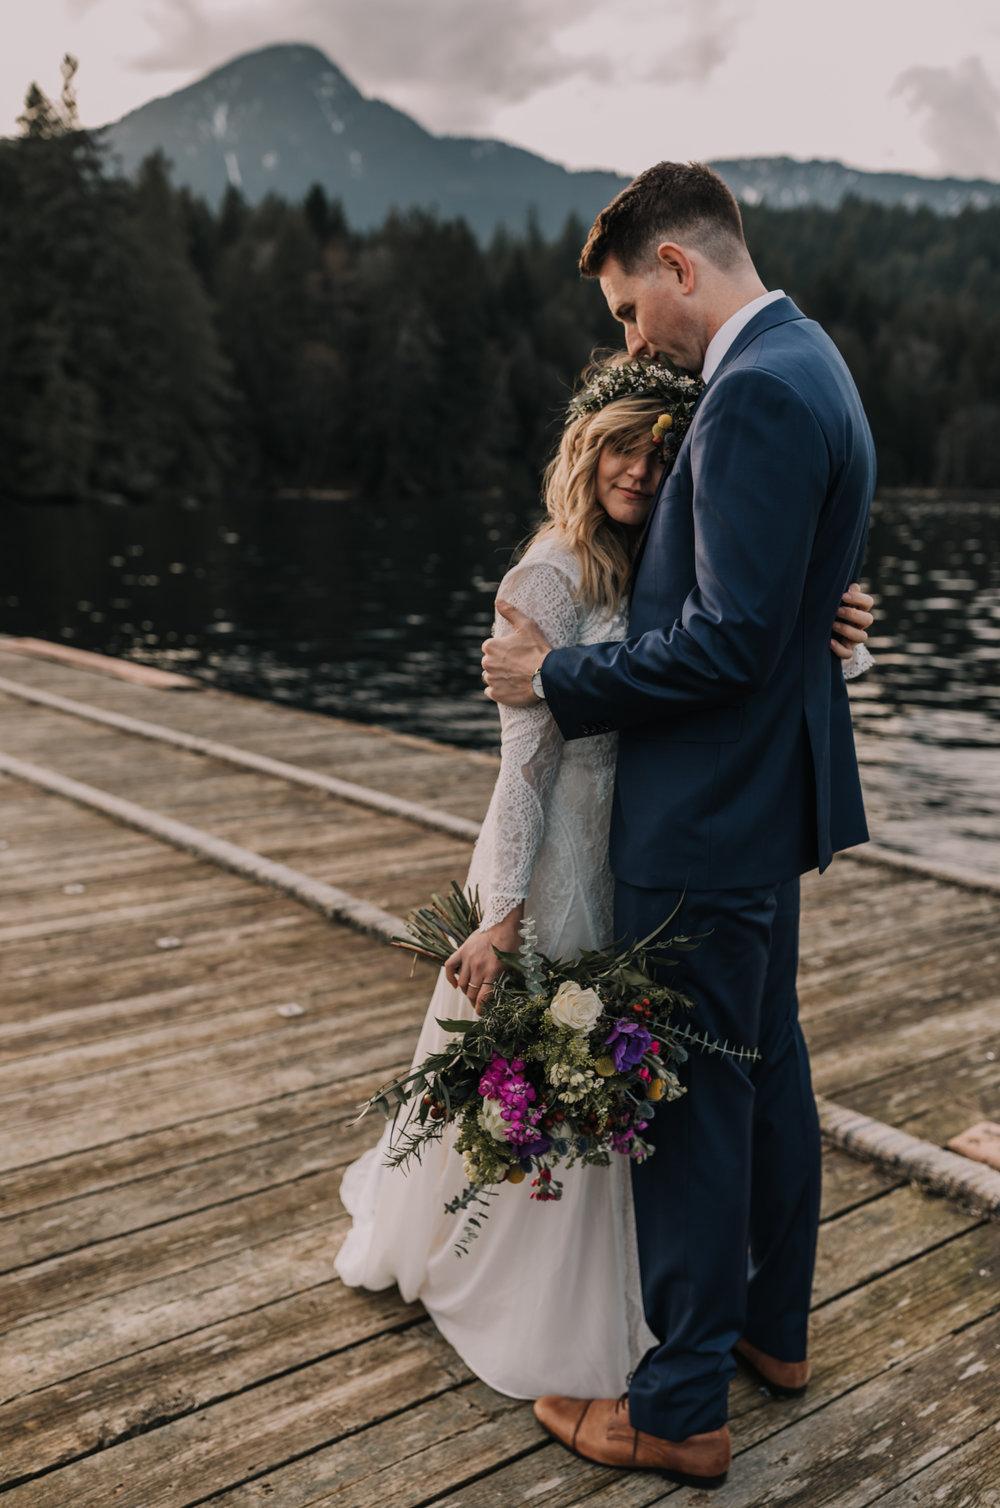 Sunshine Coast Wedding Photos - Mountain Wedding Photos - Sunshine Coast Wedding Photographer - Vancouver Wedding Photographer - Jennifer Picard173-1.JPG